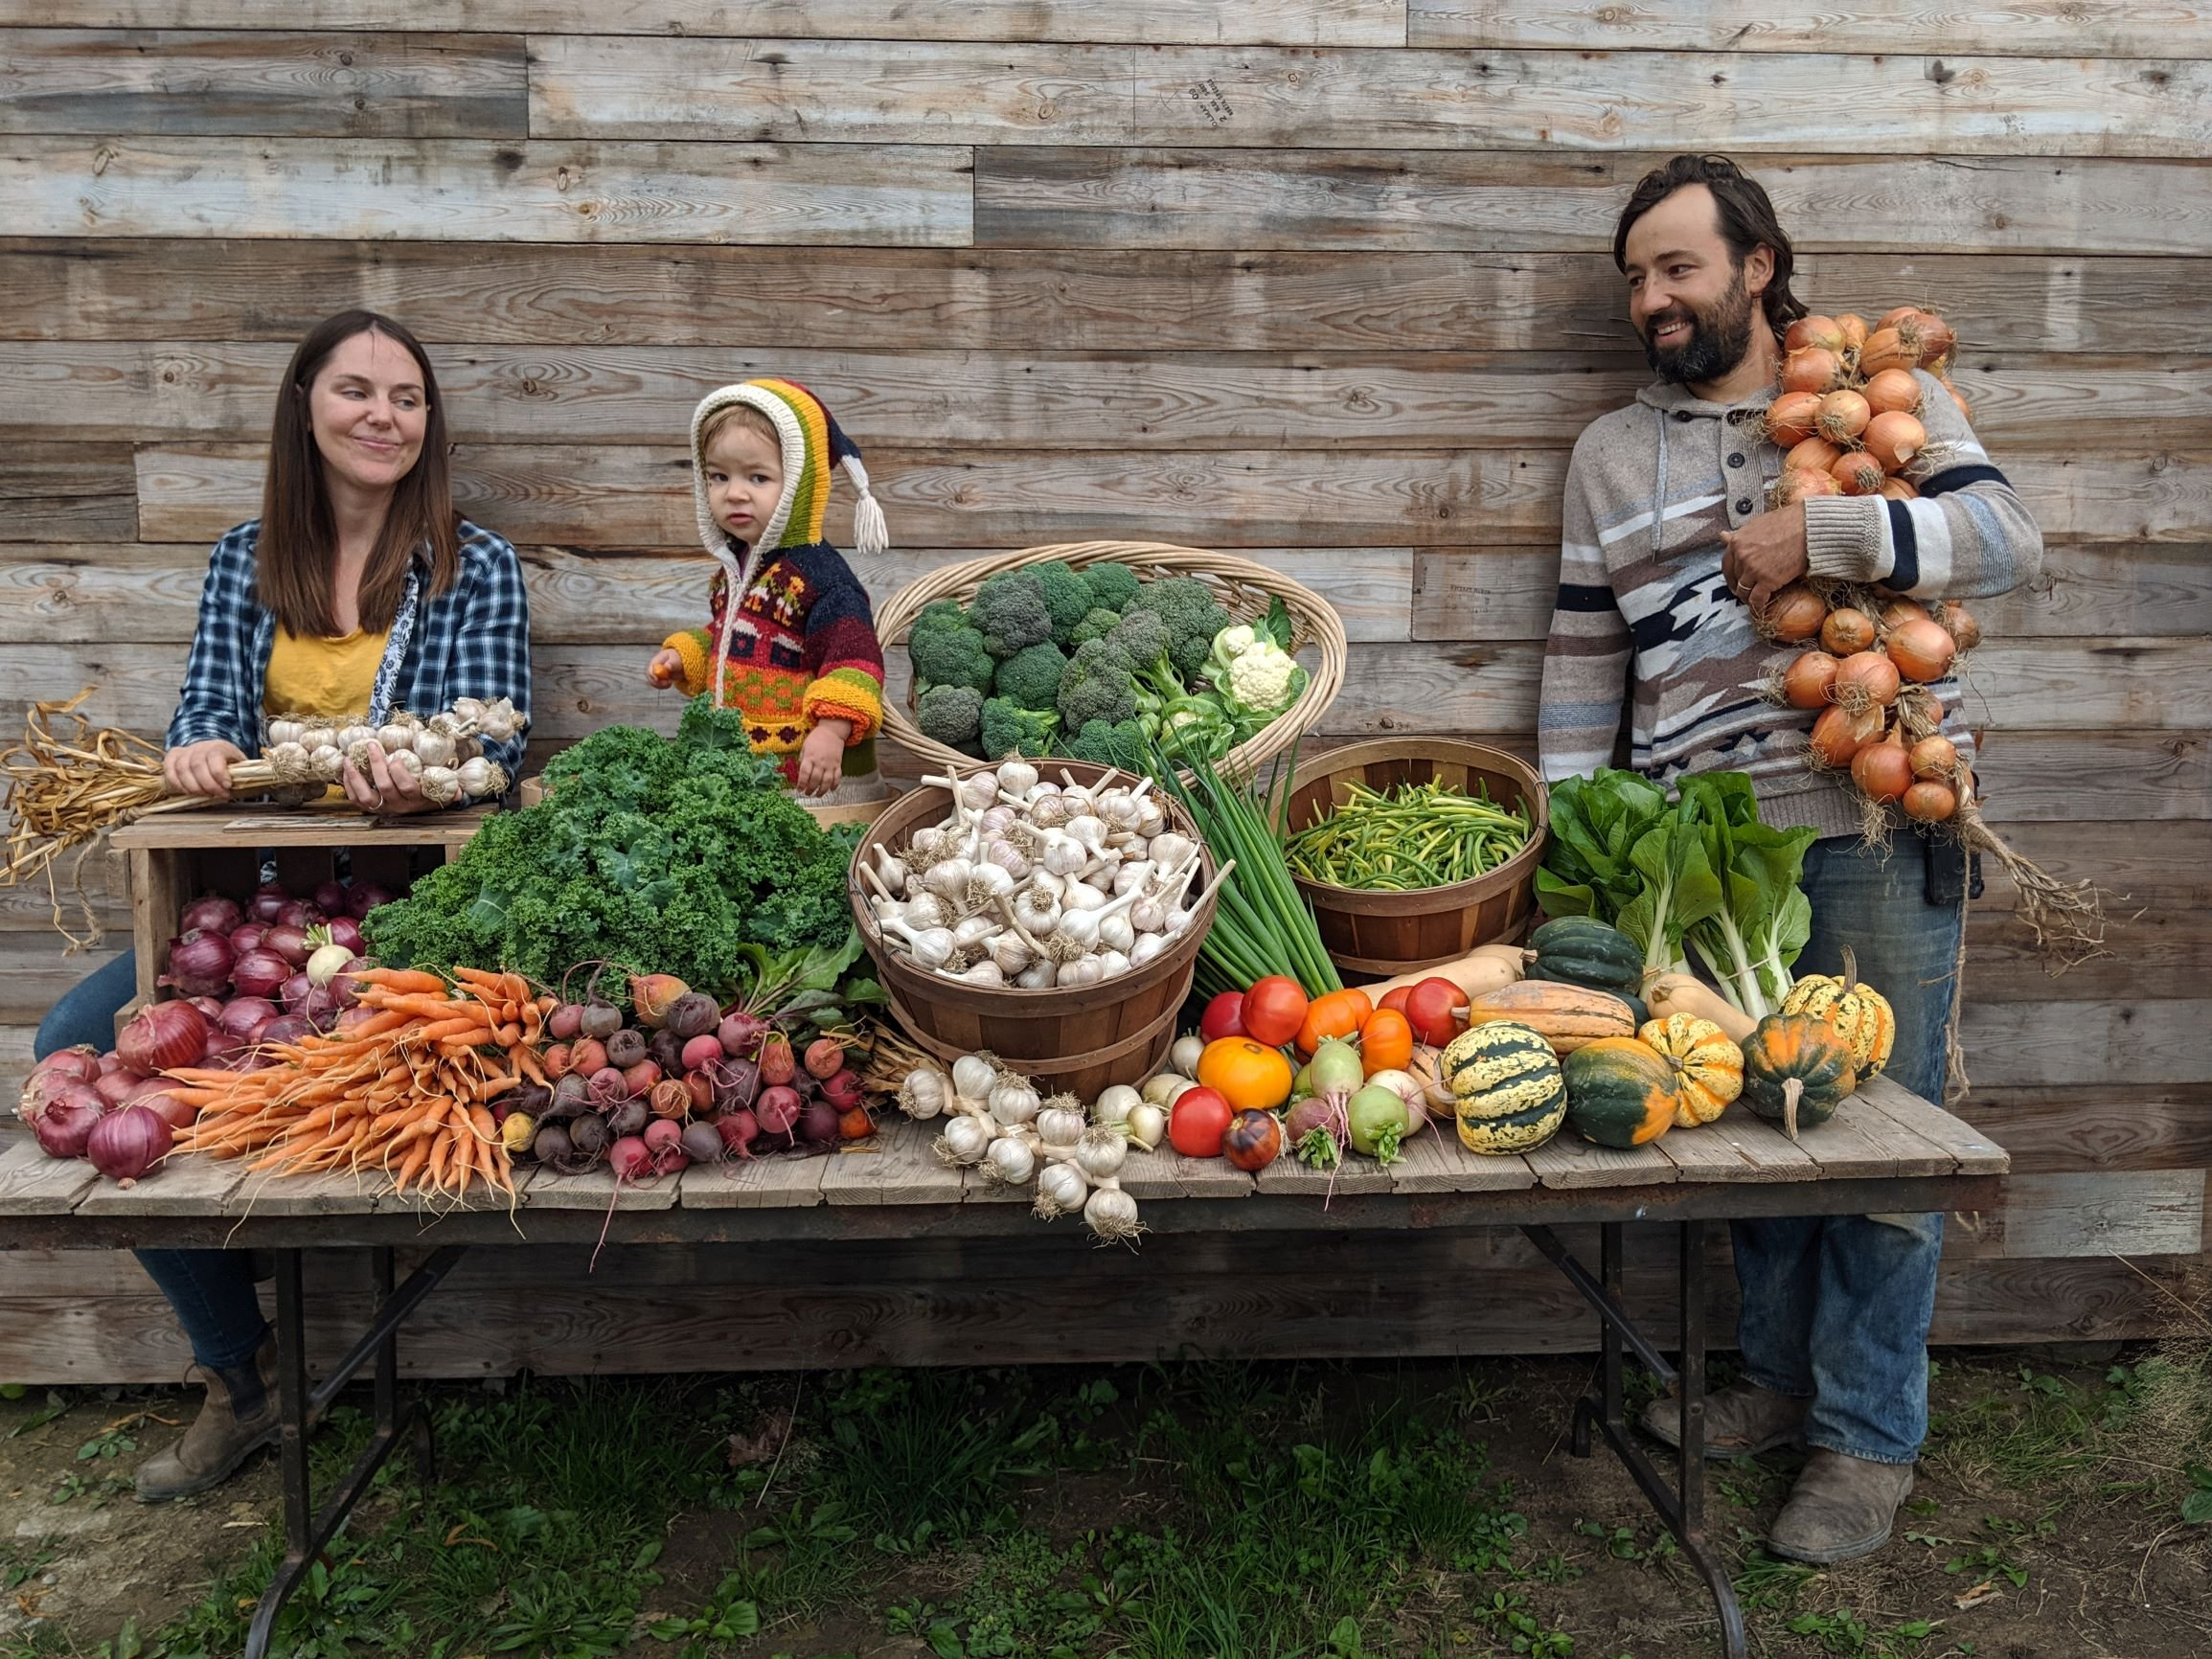 Previous Happening: Veggie Share - Week 19